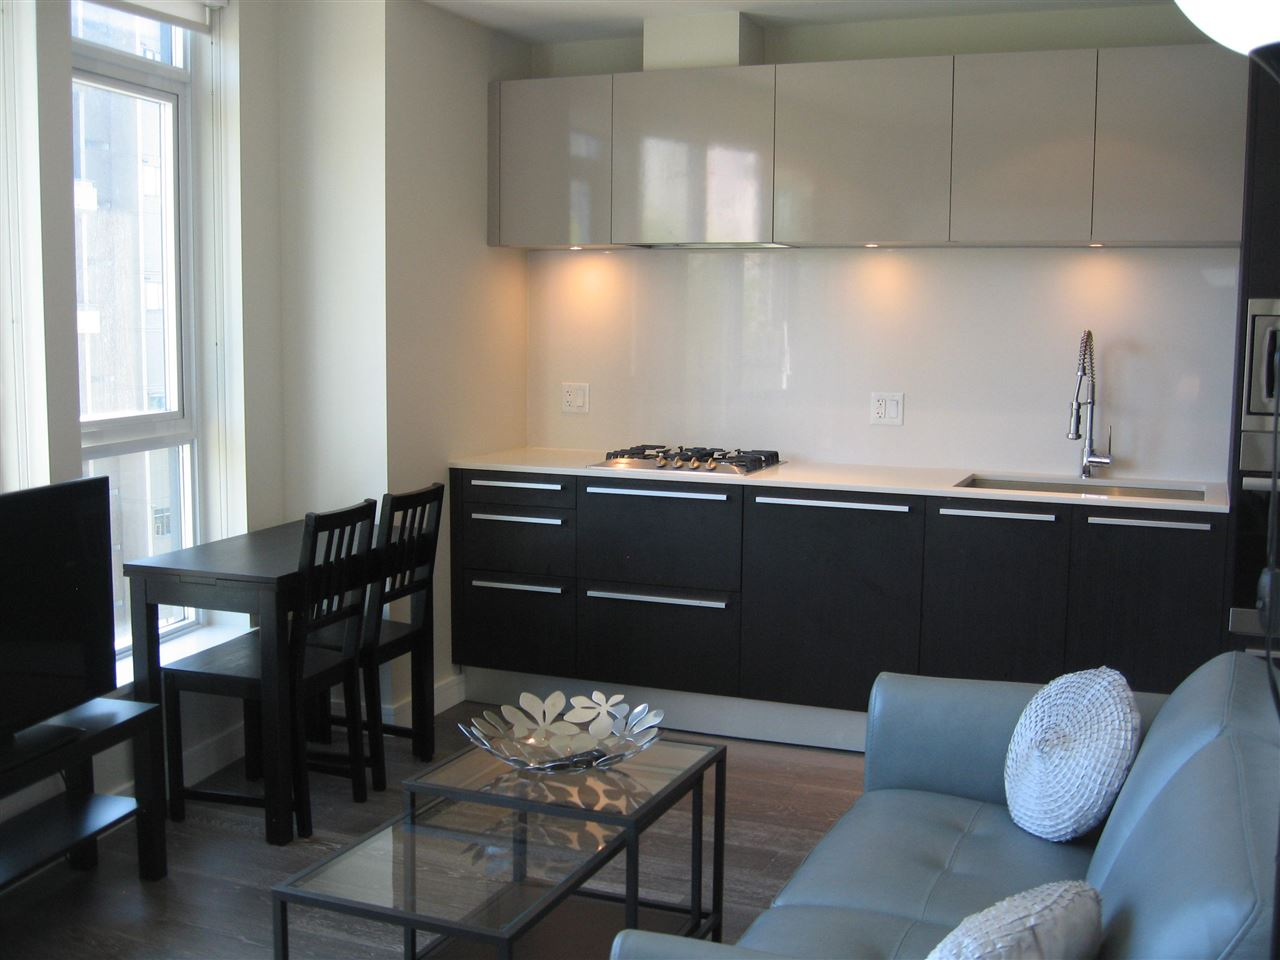 Condo Apartment at 904 1221 BIDWELL STREET, Unit 904, Vancouver West, British Columbia. Image 1